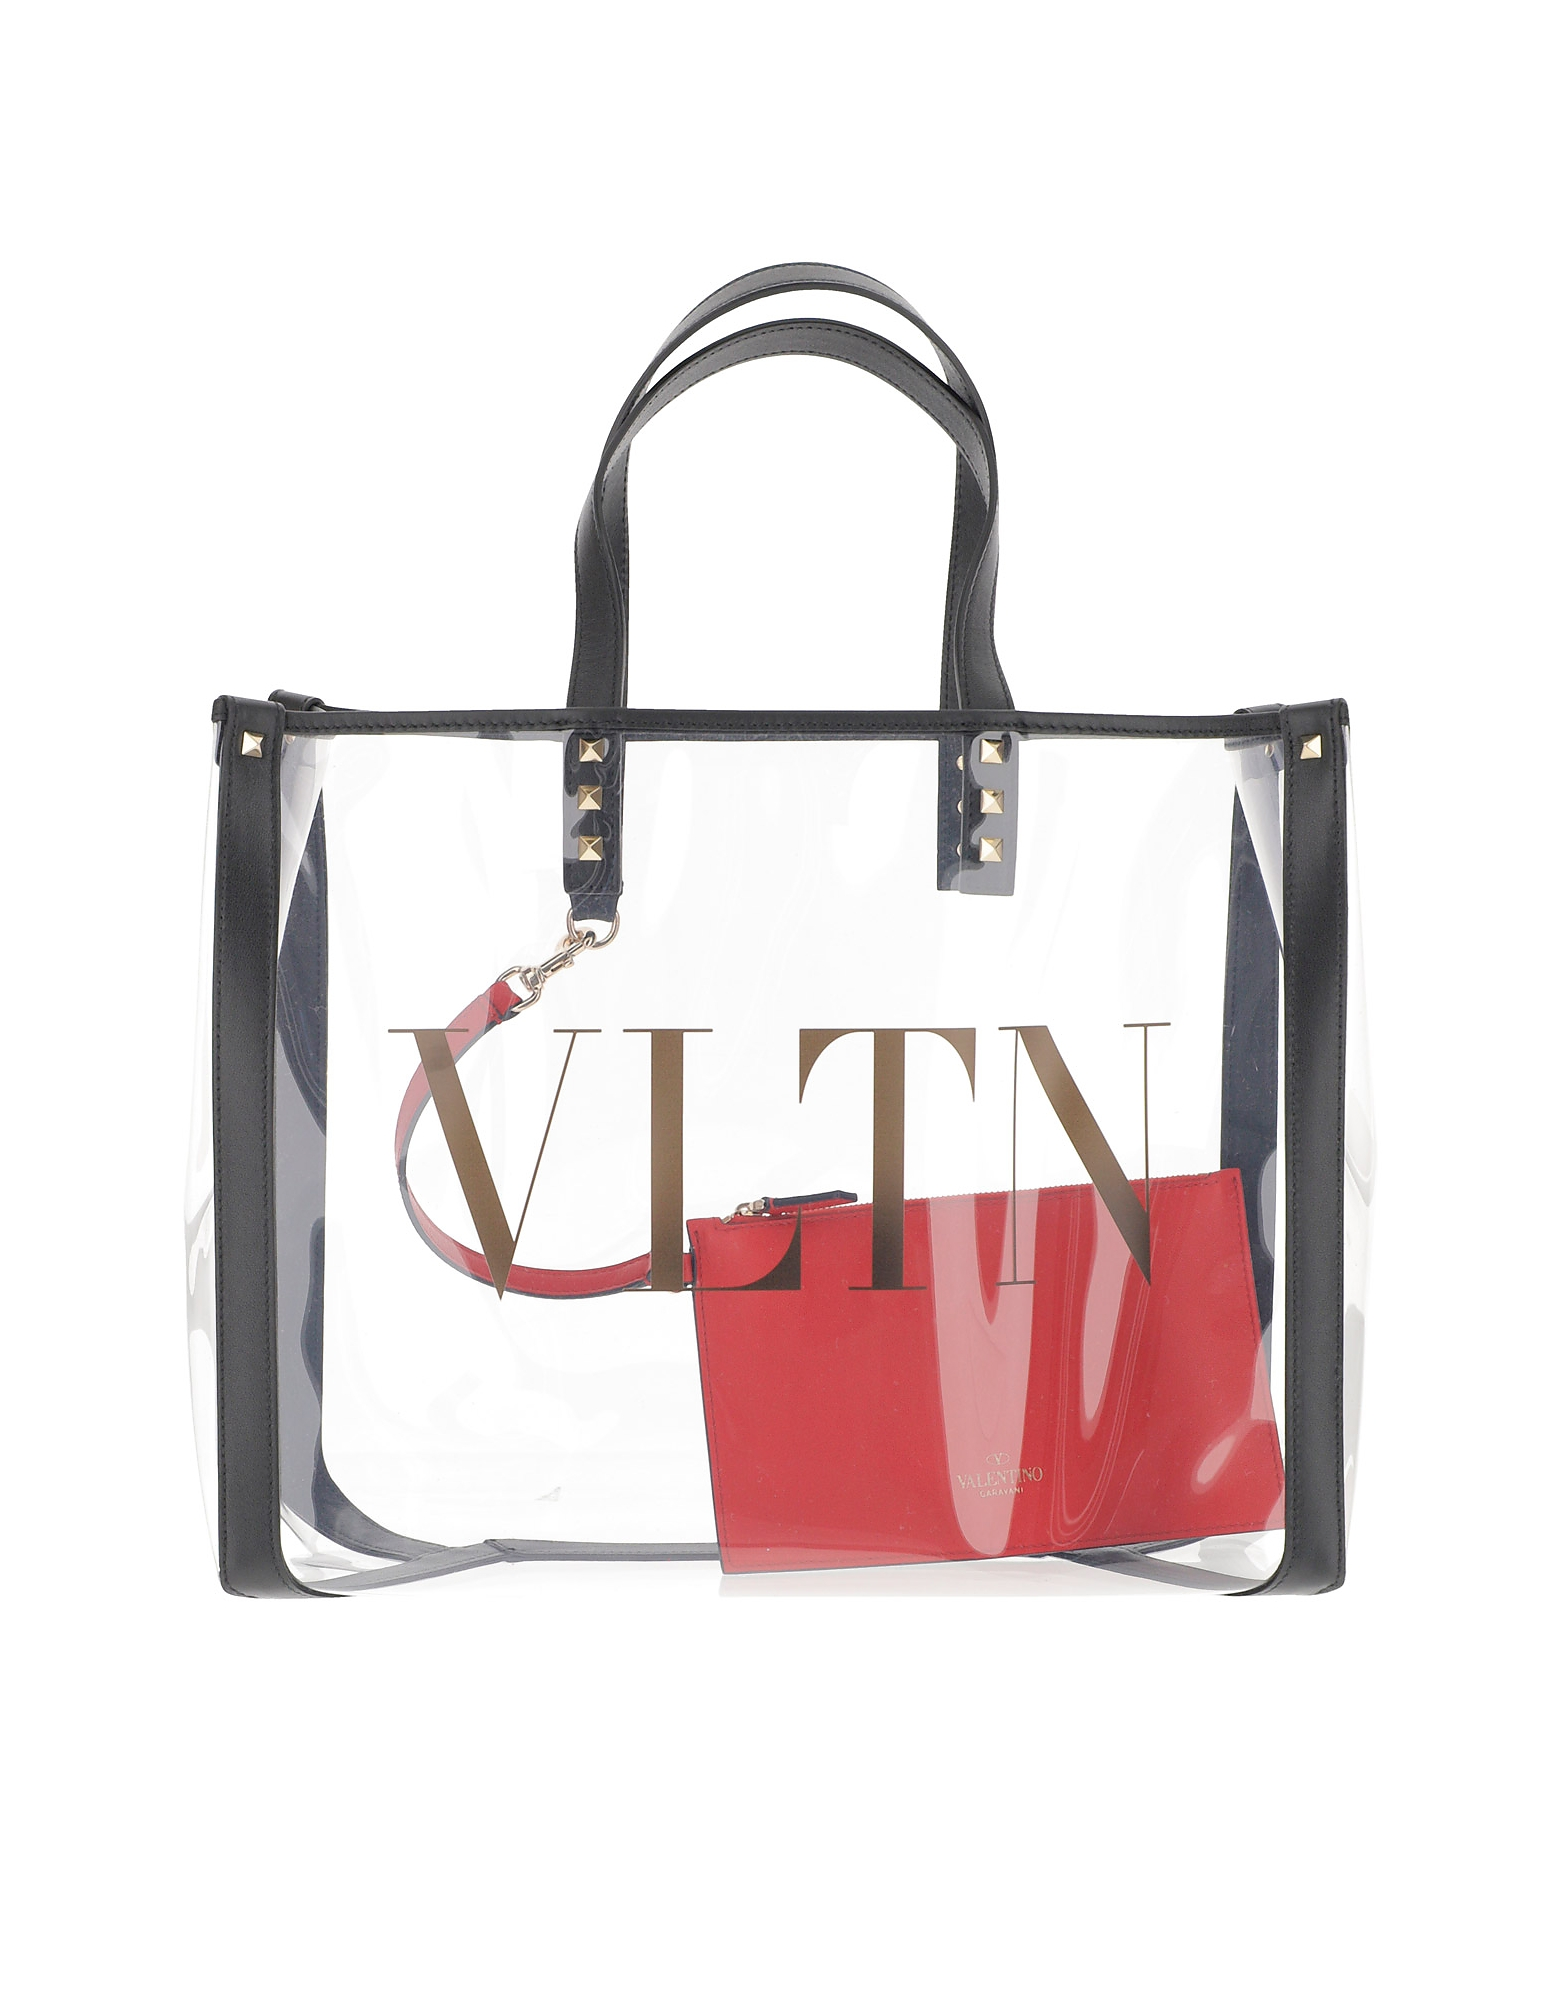 Valentino Designer Handbags, VLTN Transparent Tote Bag